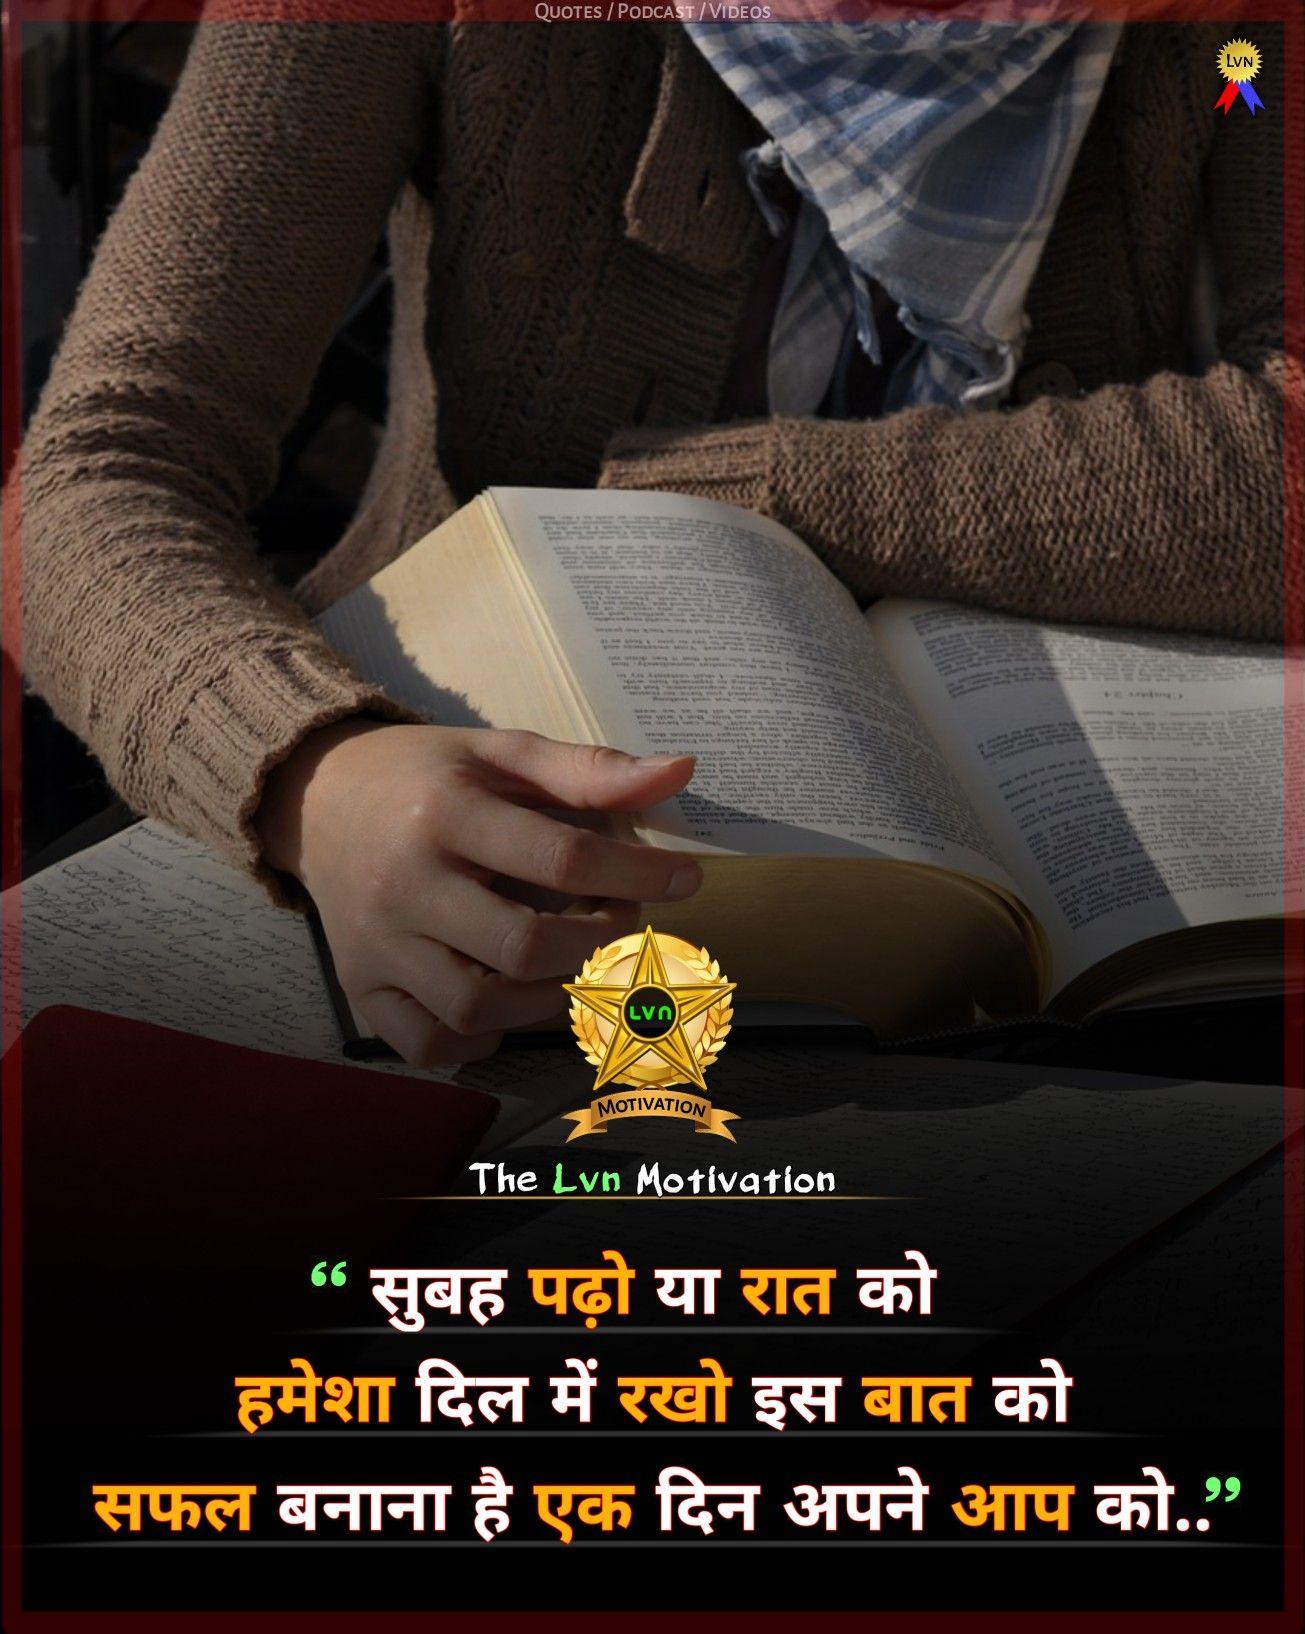 Best study motivational quotes in hindi. Safalta ke vichar